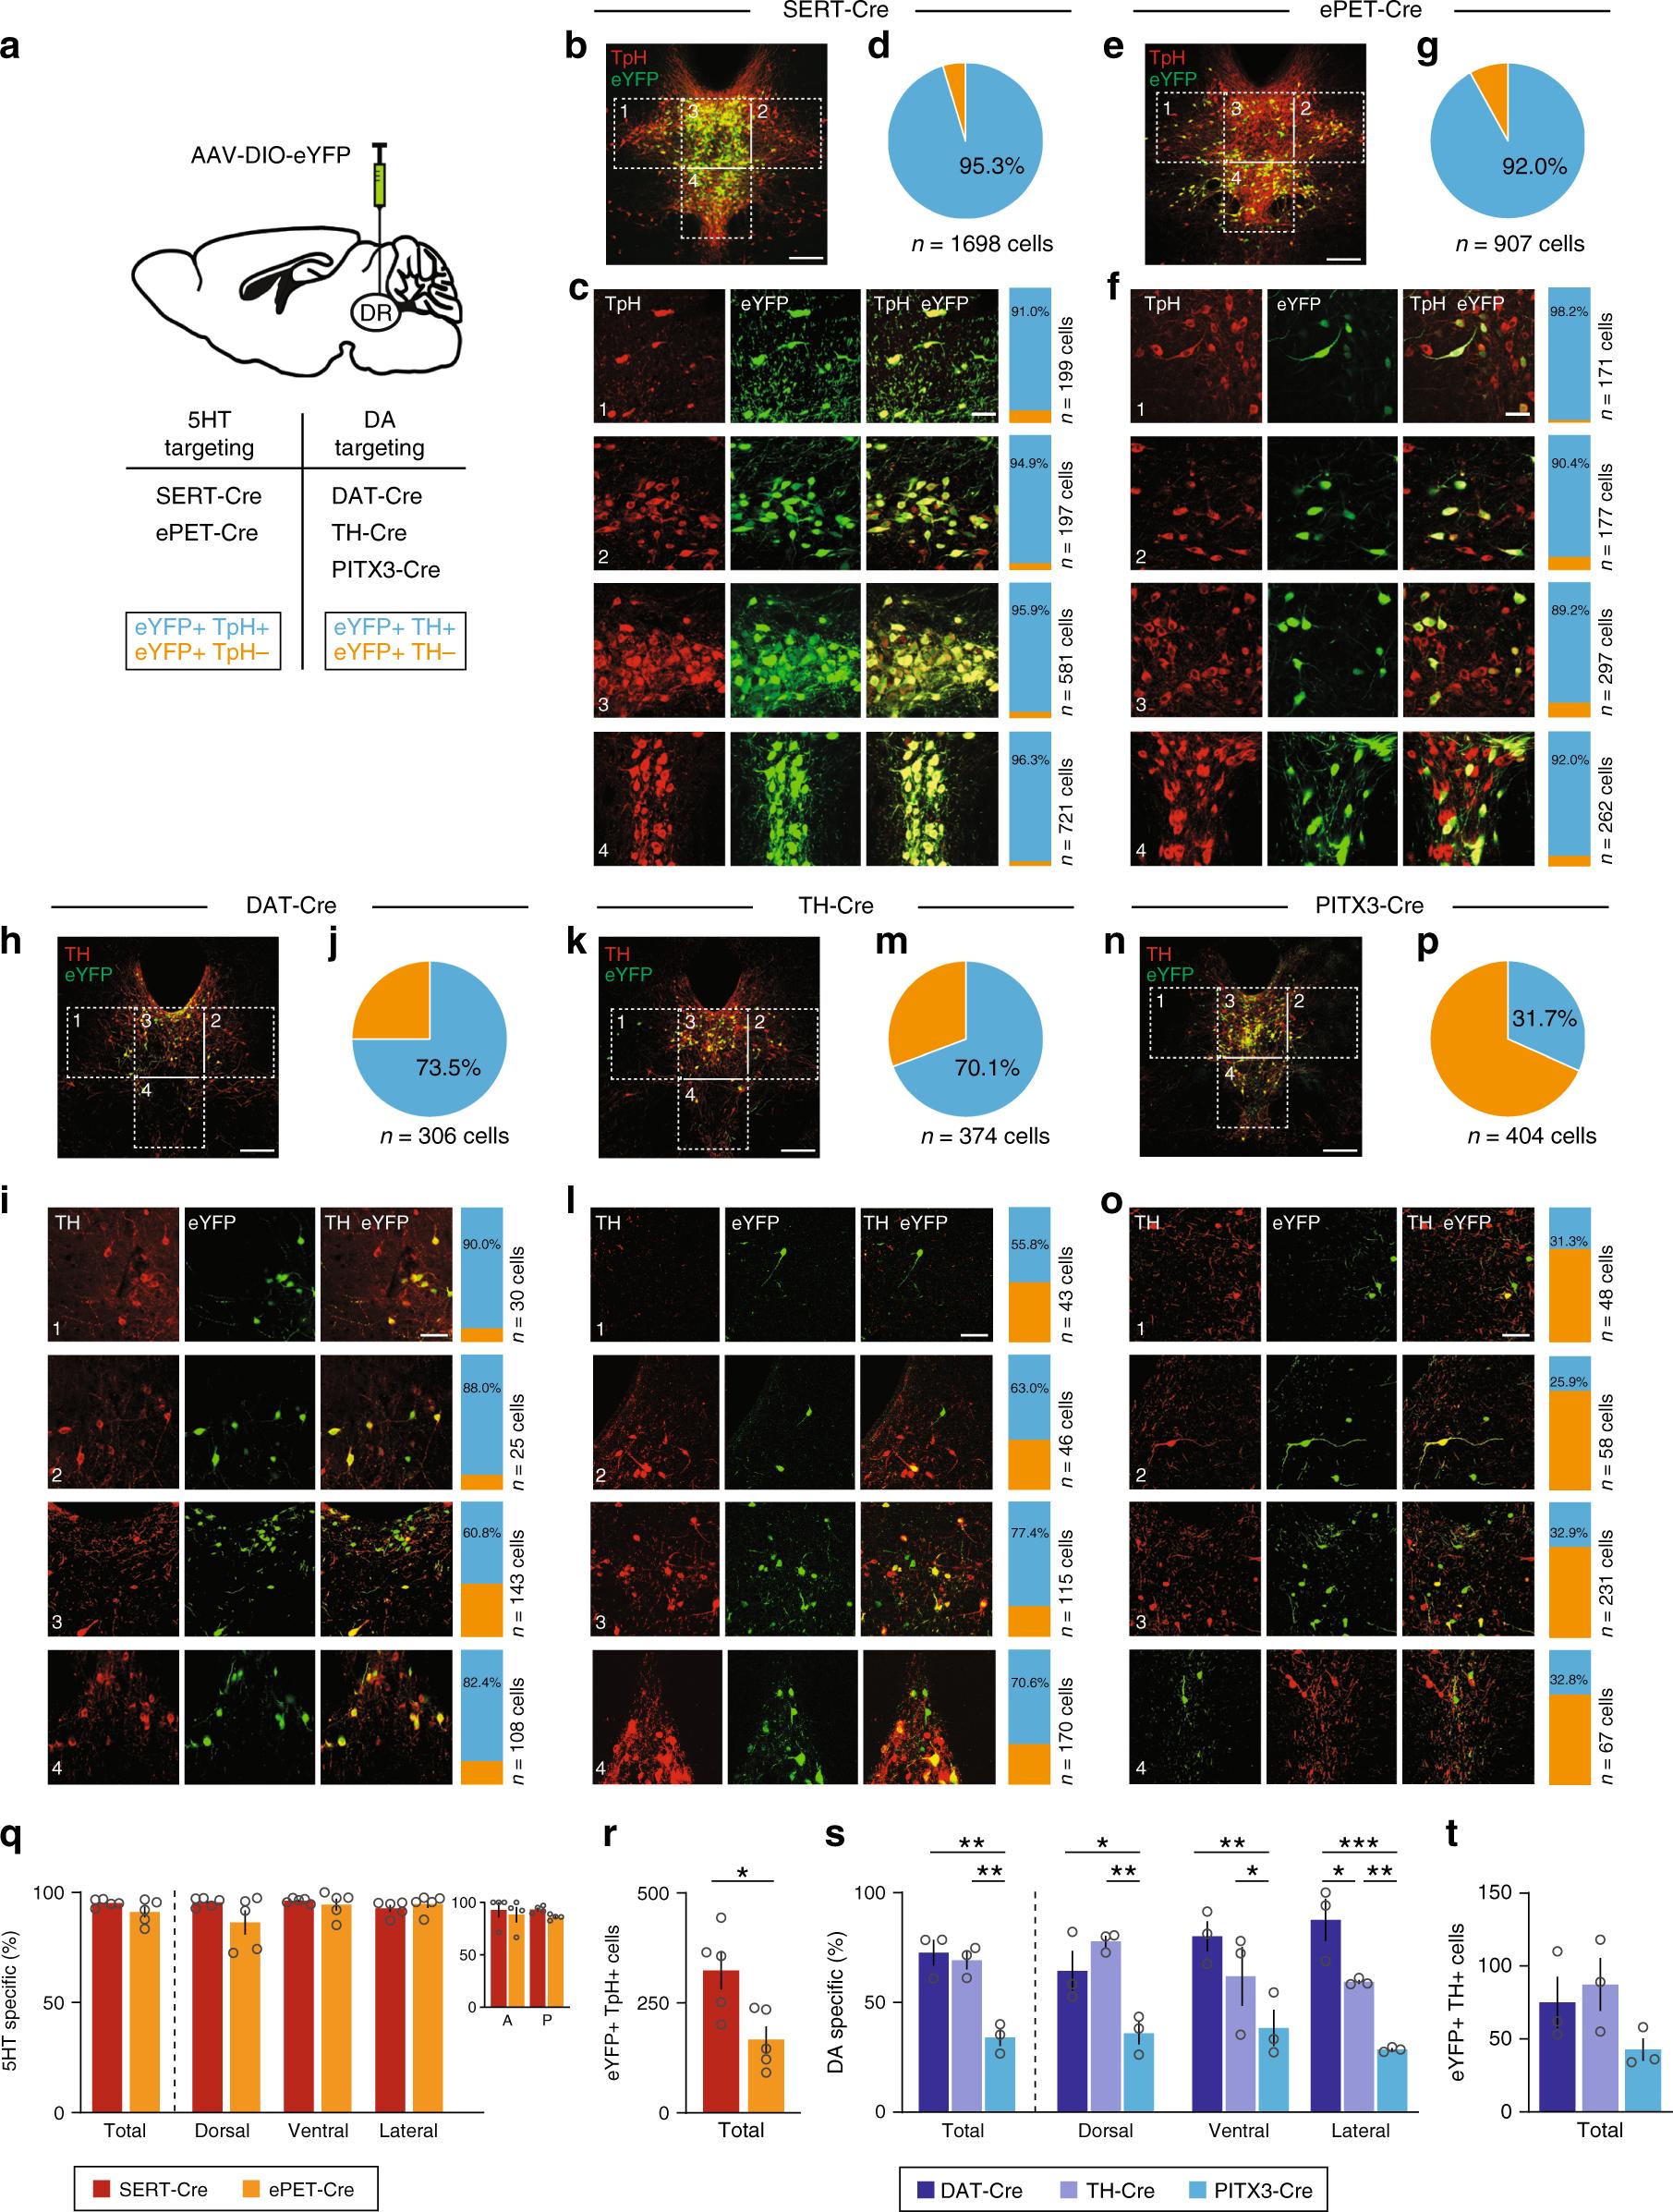 Characterization of transgenic mouse models targeting neuromodulatory